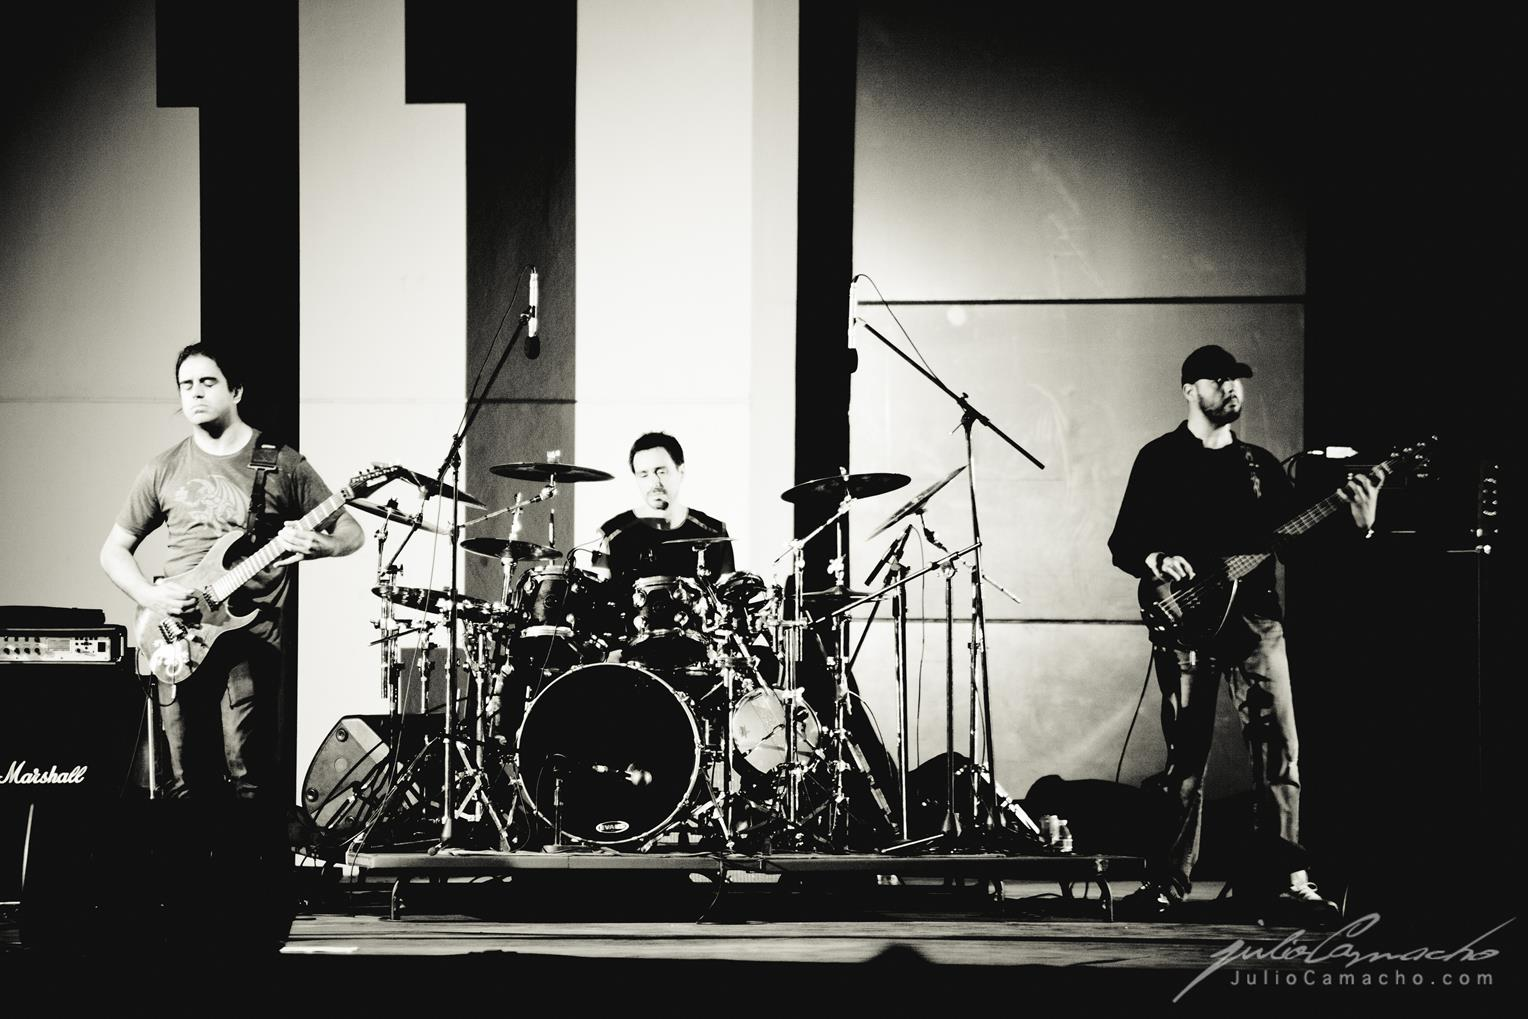 2014-10-30 31 CAST TOUR Ensenada y Tijuana - 0538 - www.Juli (Copy).jpg